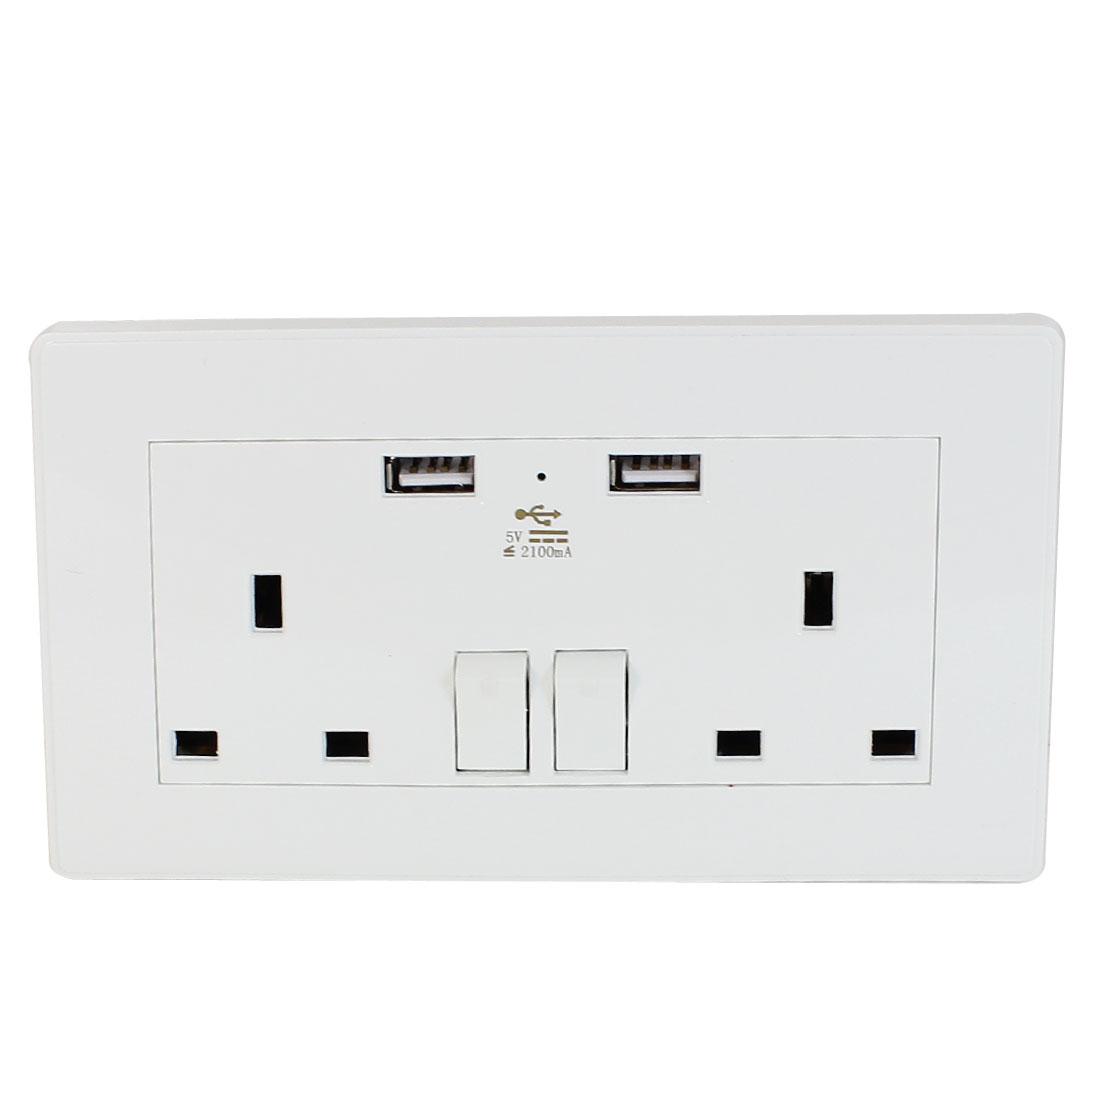 Dual AC 110V-250V UK Socket 2 USB Port Charging DC 5V 2100mA Mains Power Switch Wall Outlet